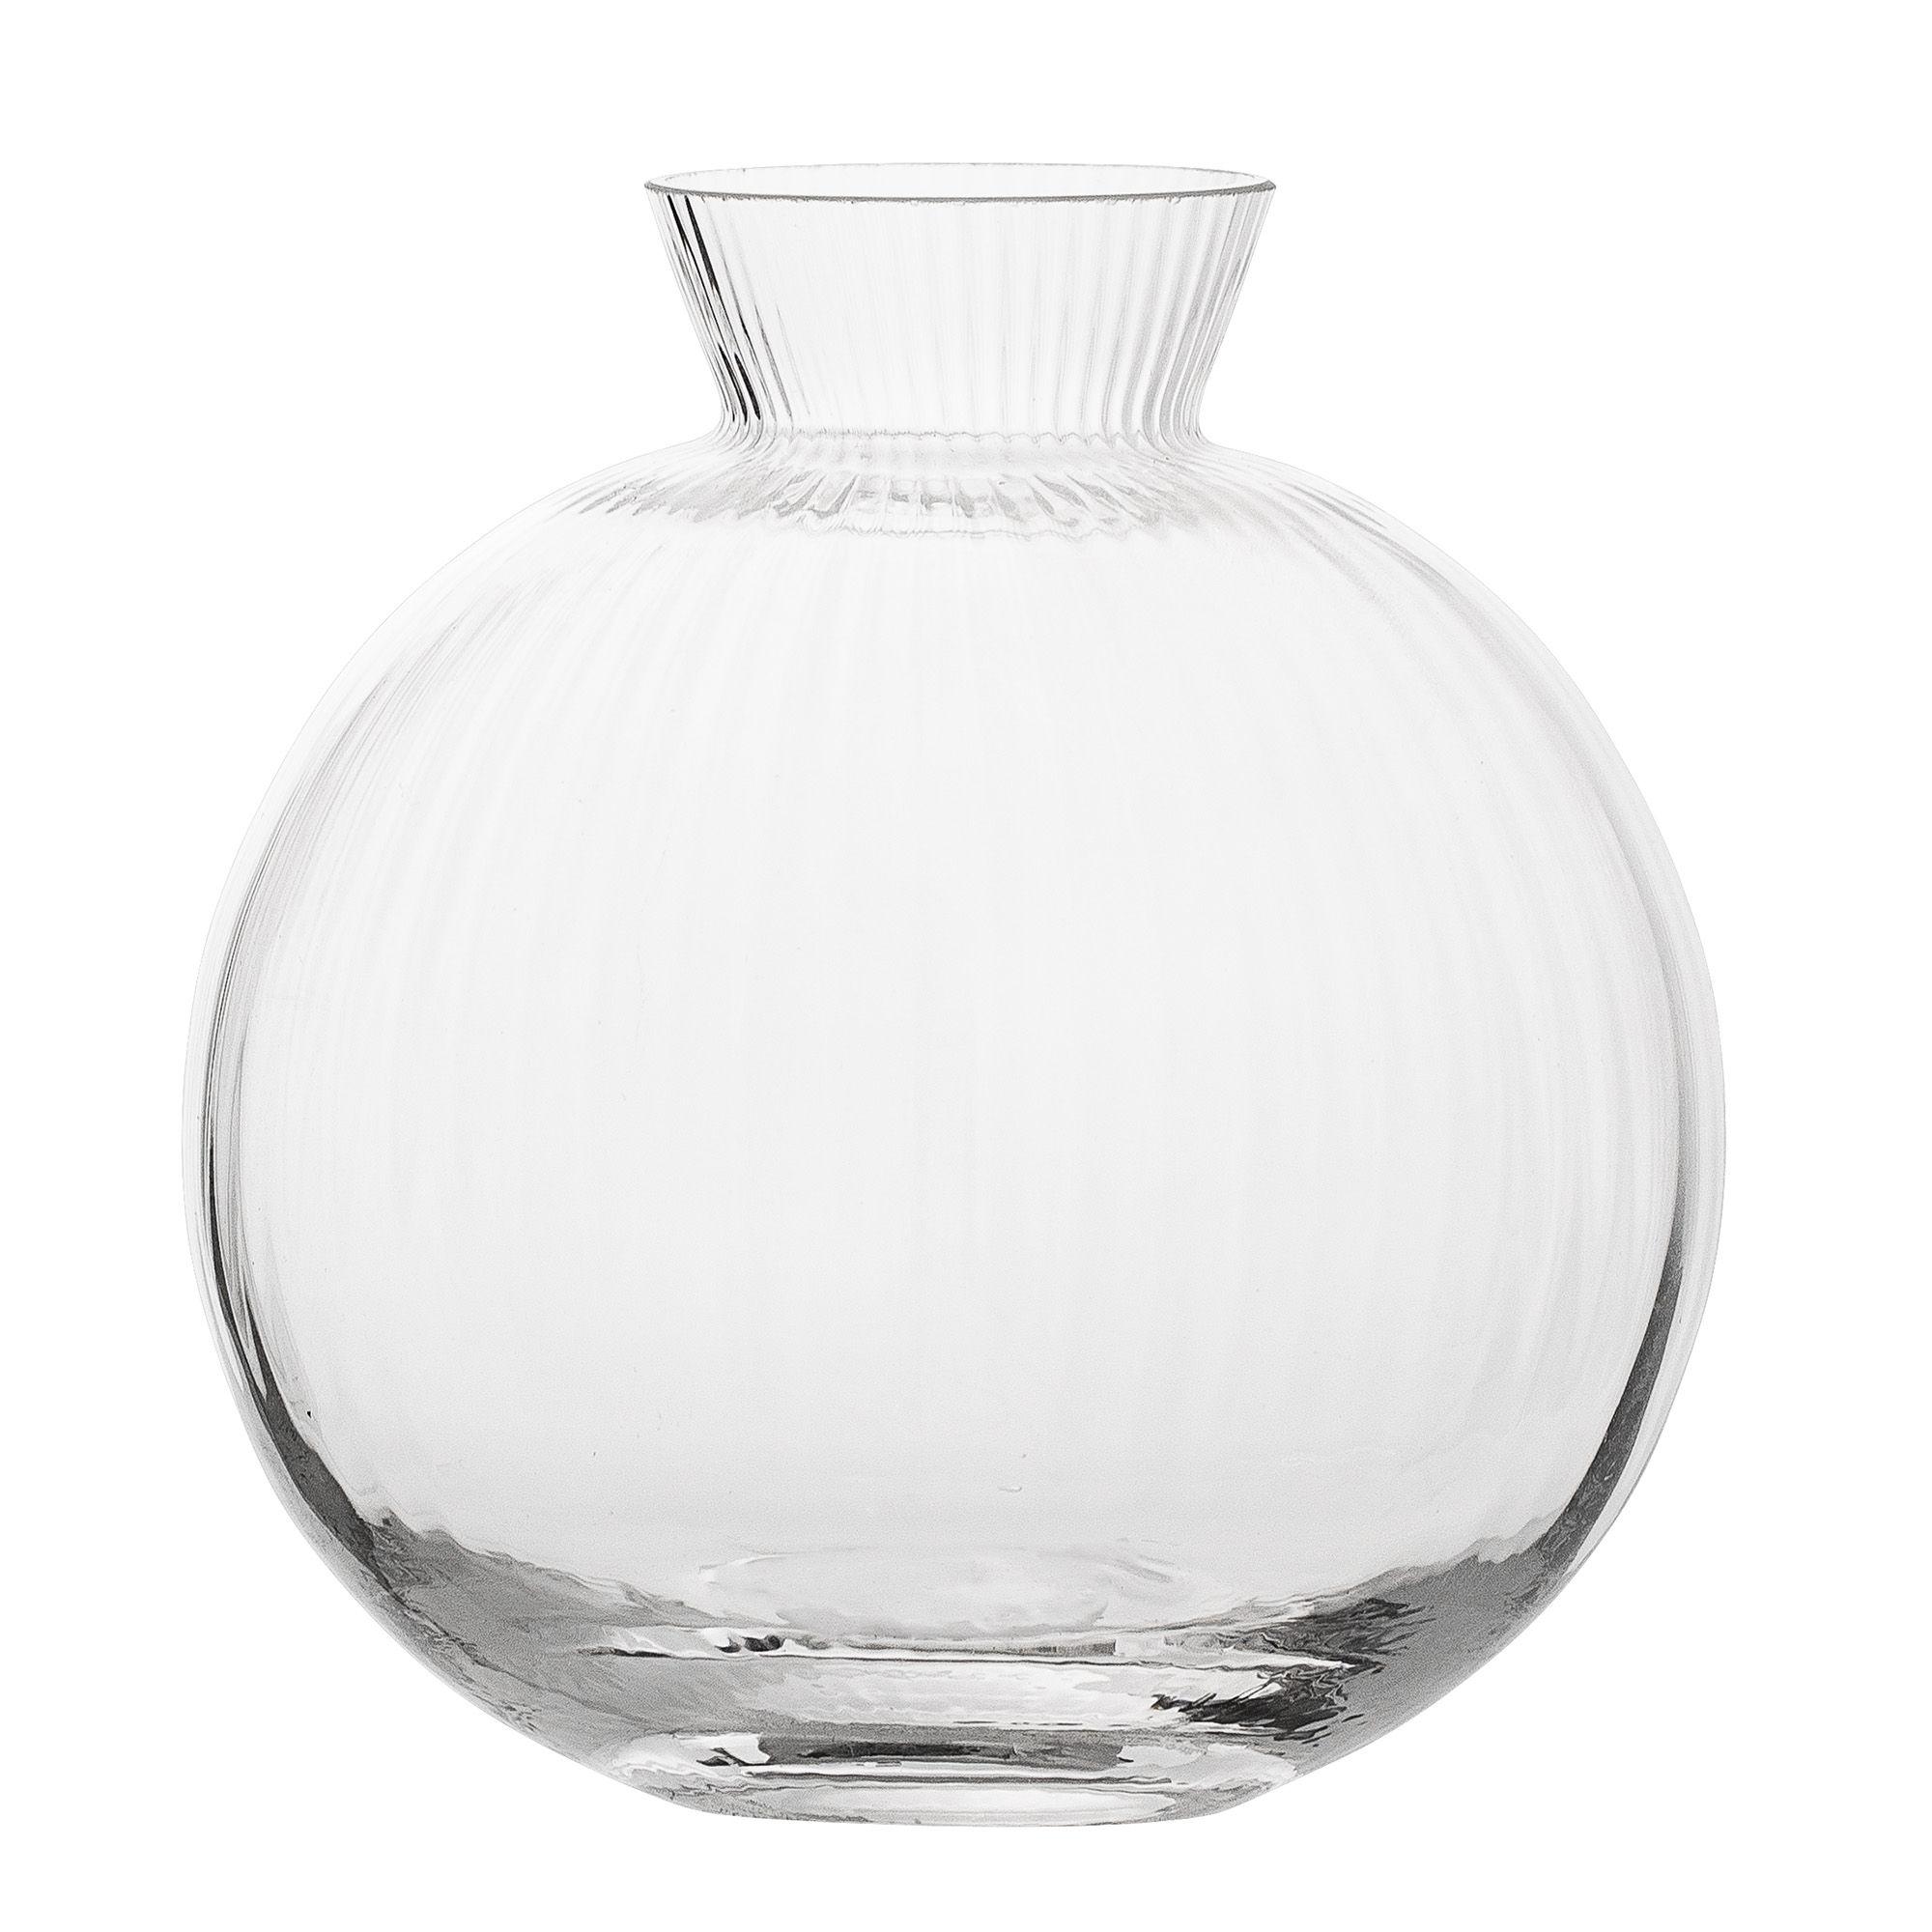 Decoration - Vases - Vase - / Ø 11 cm by Bloomingville - Transparent - Glass